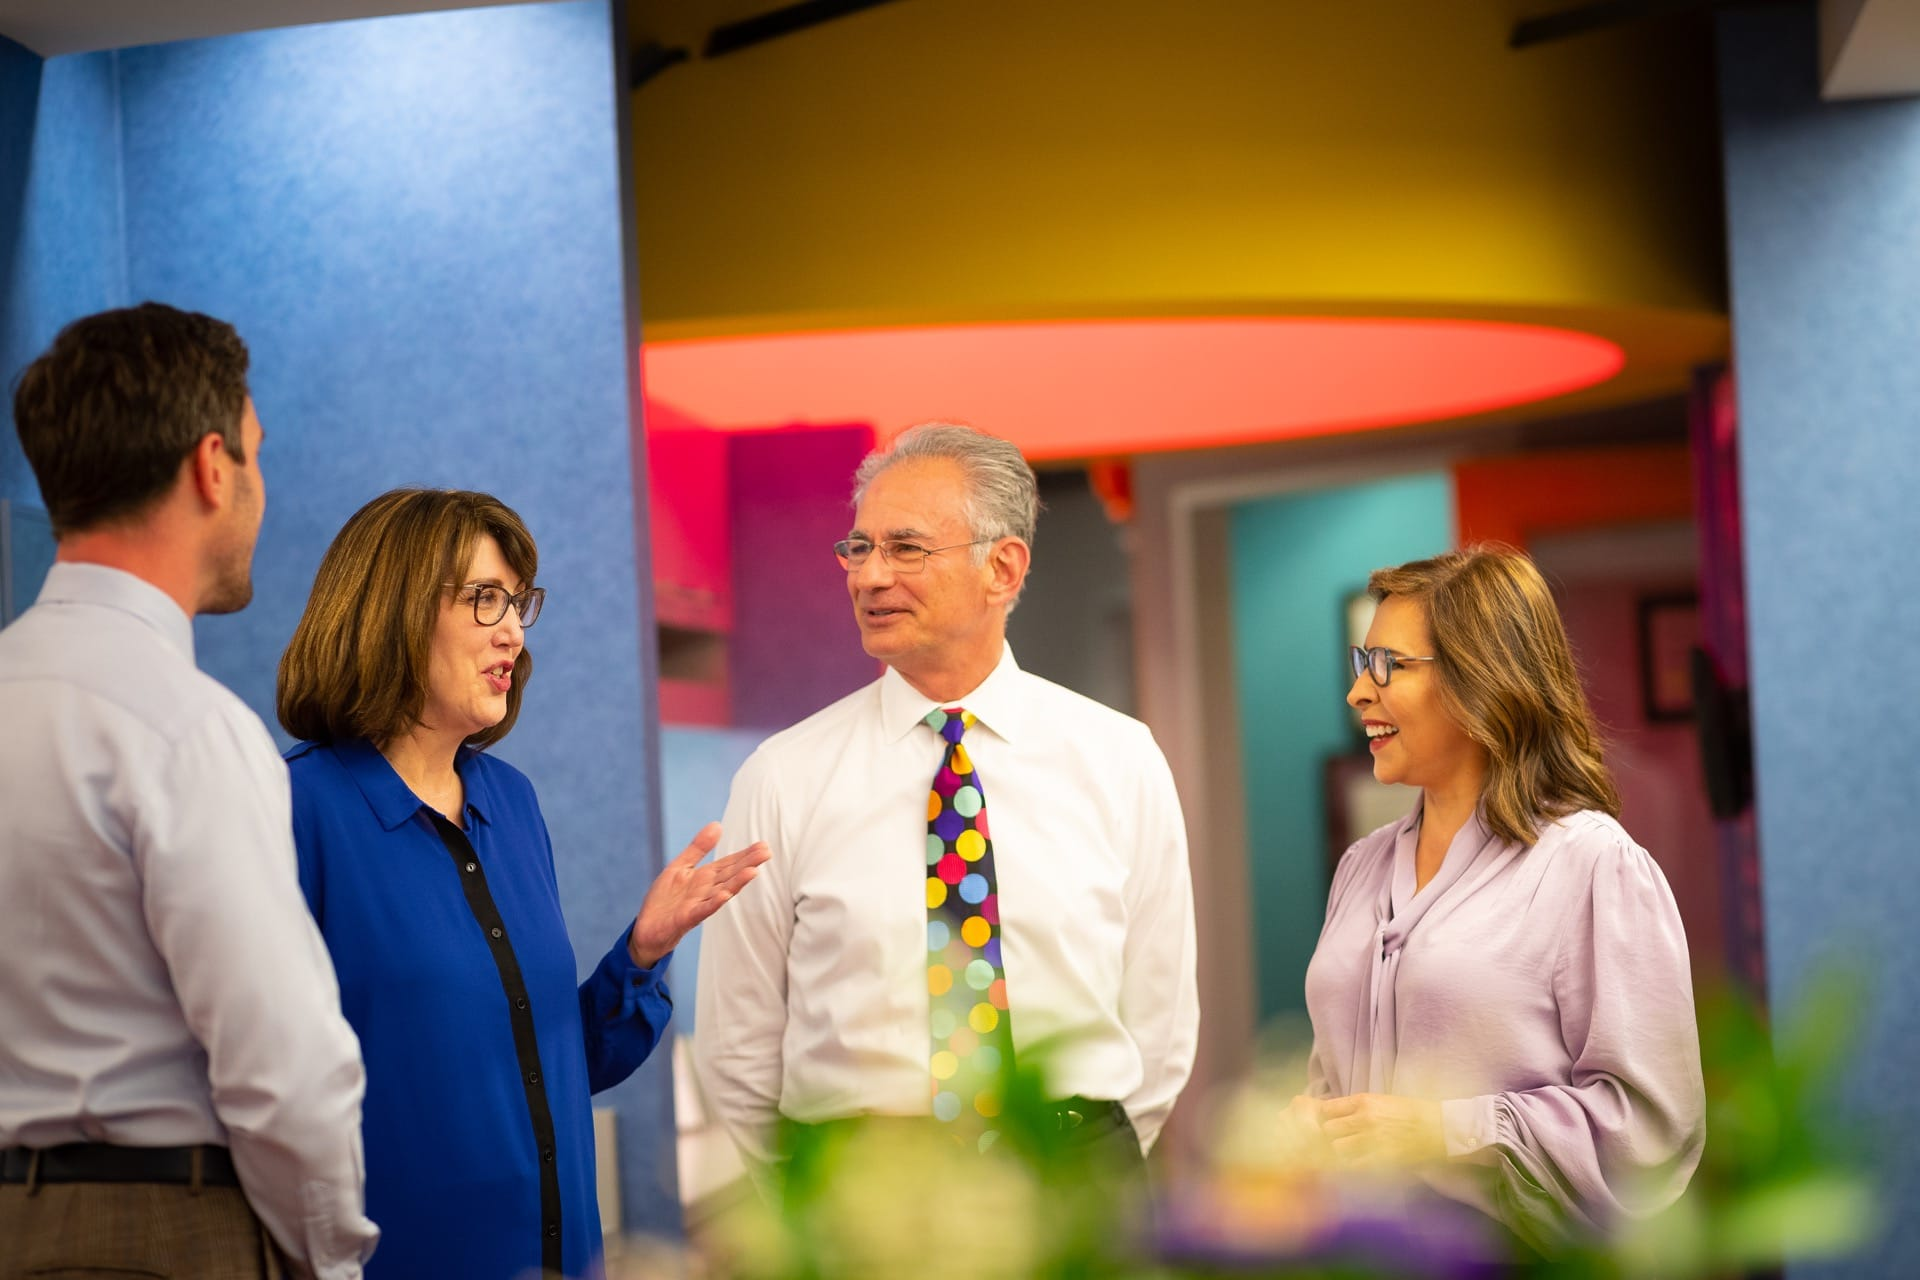 Doctors Candid Groupings MyKidsDDS Dallas TX Dentist 30 - Meet Dr. Gayle Glenn, DDS, MSD, PA